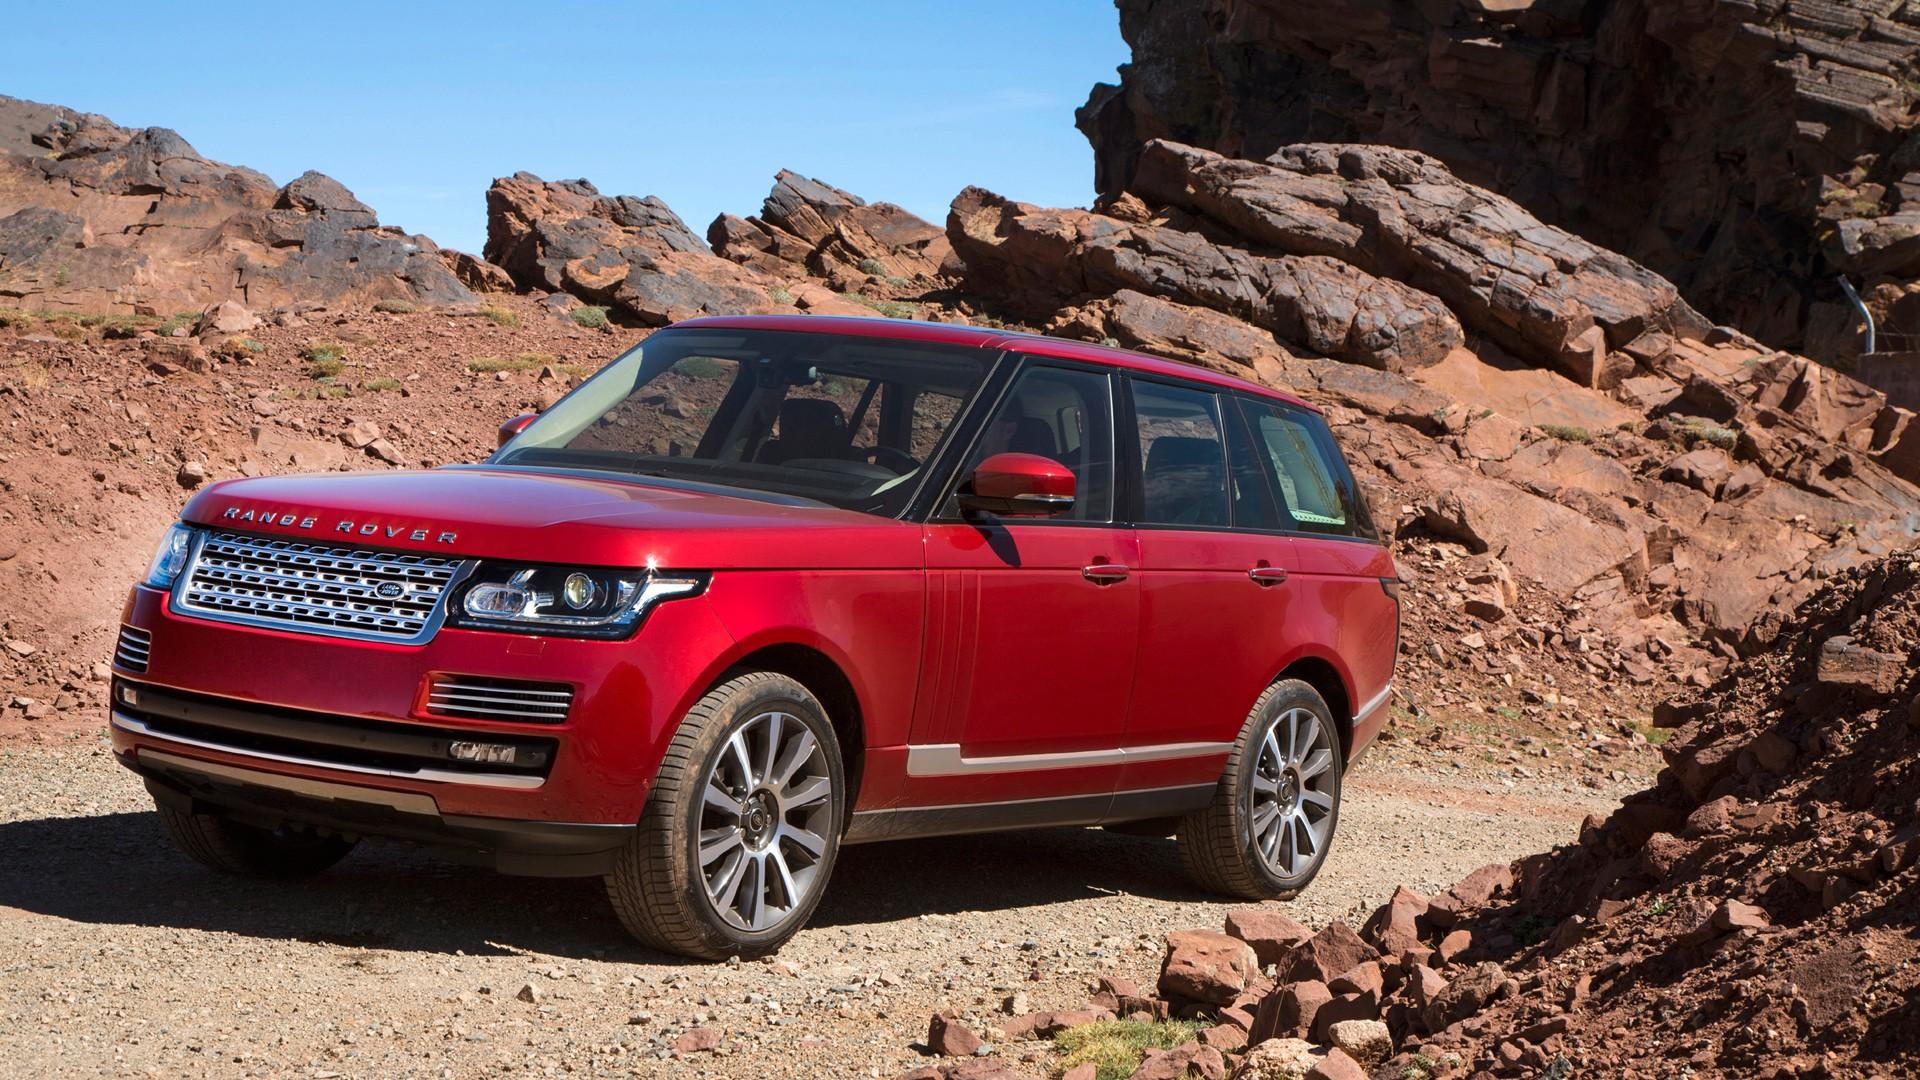 Black Range Rover Sport Wallpaper: 2013 Land Rover Range Rover In Morocco Wallpaper